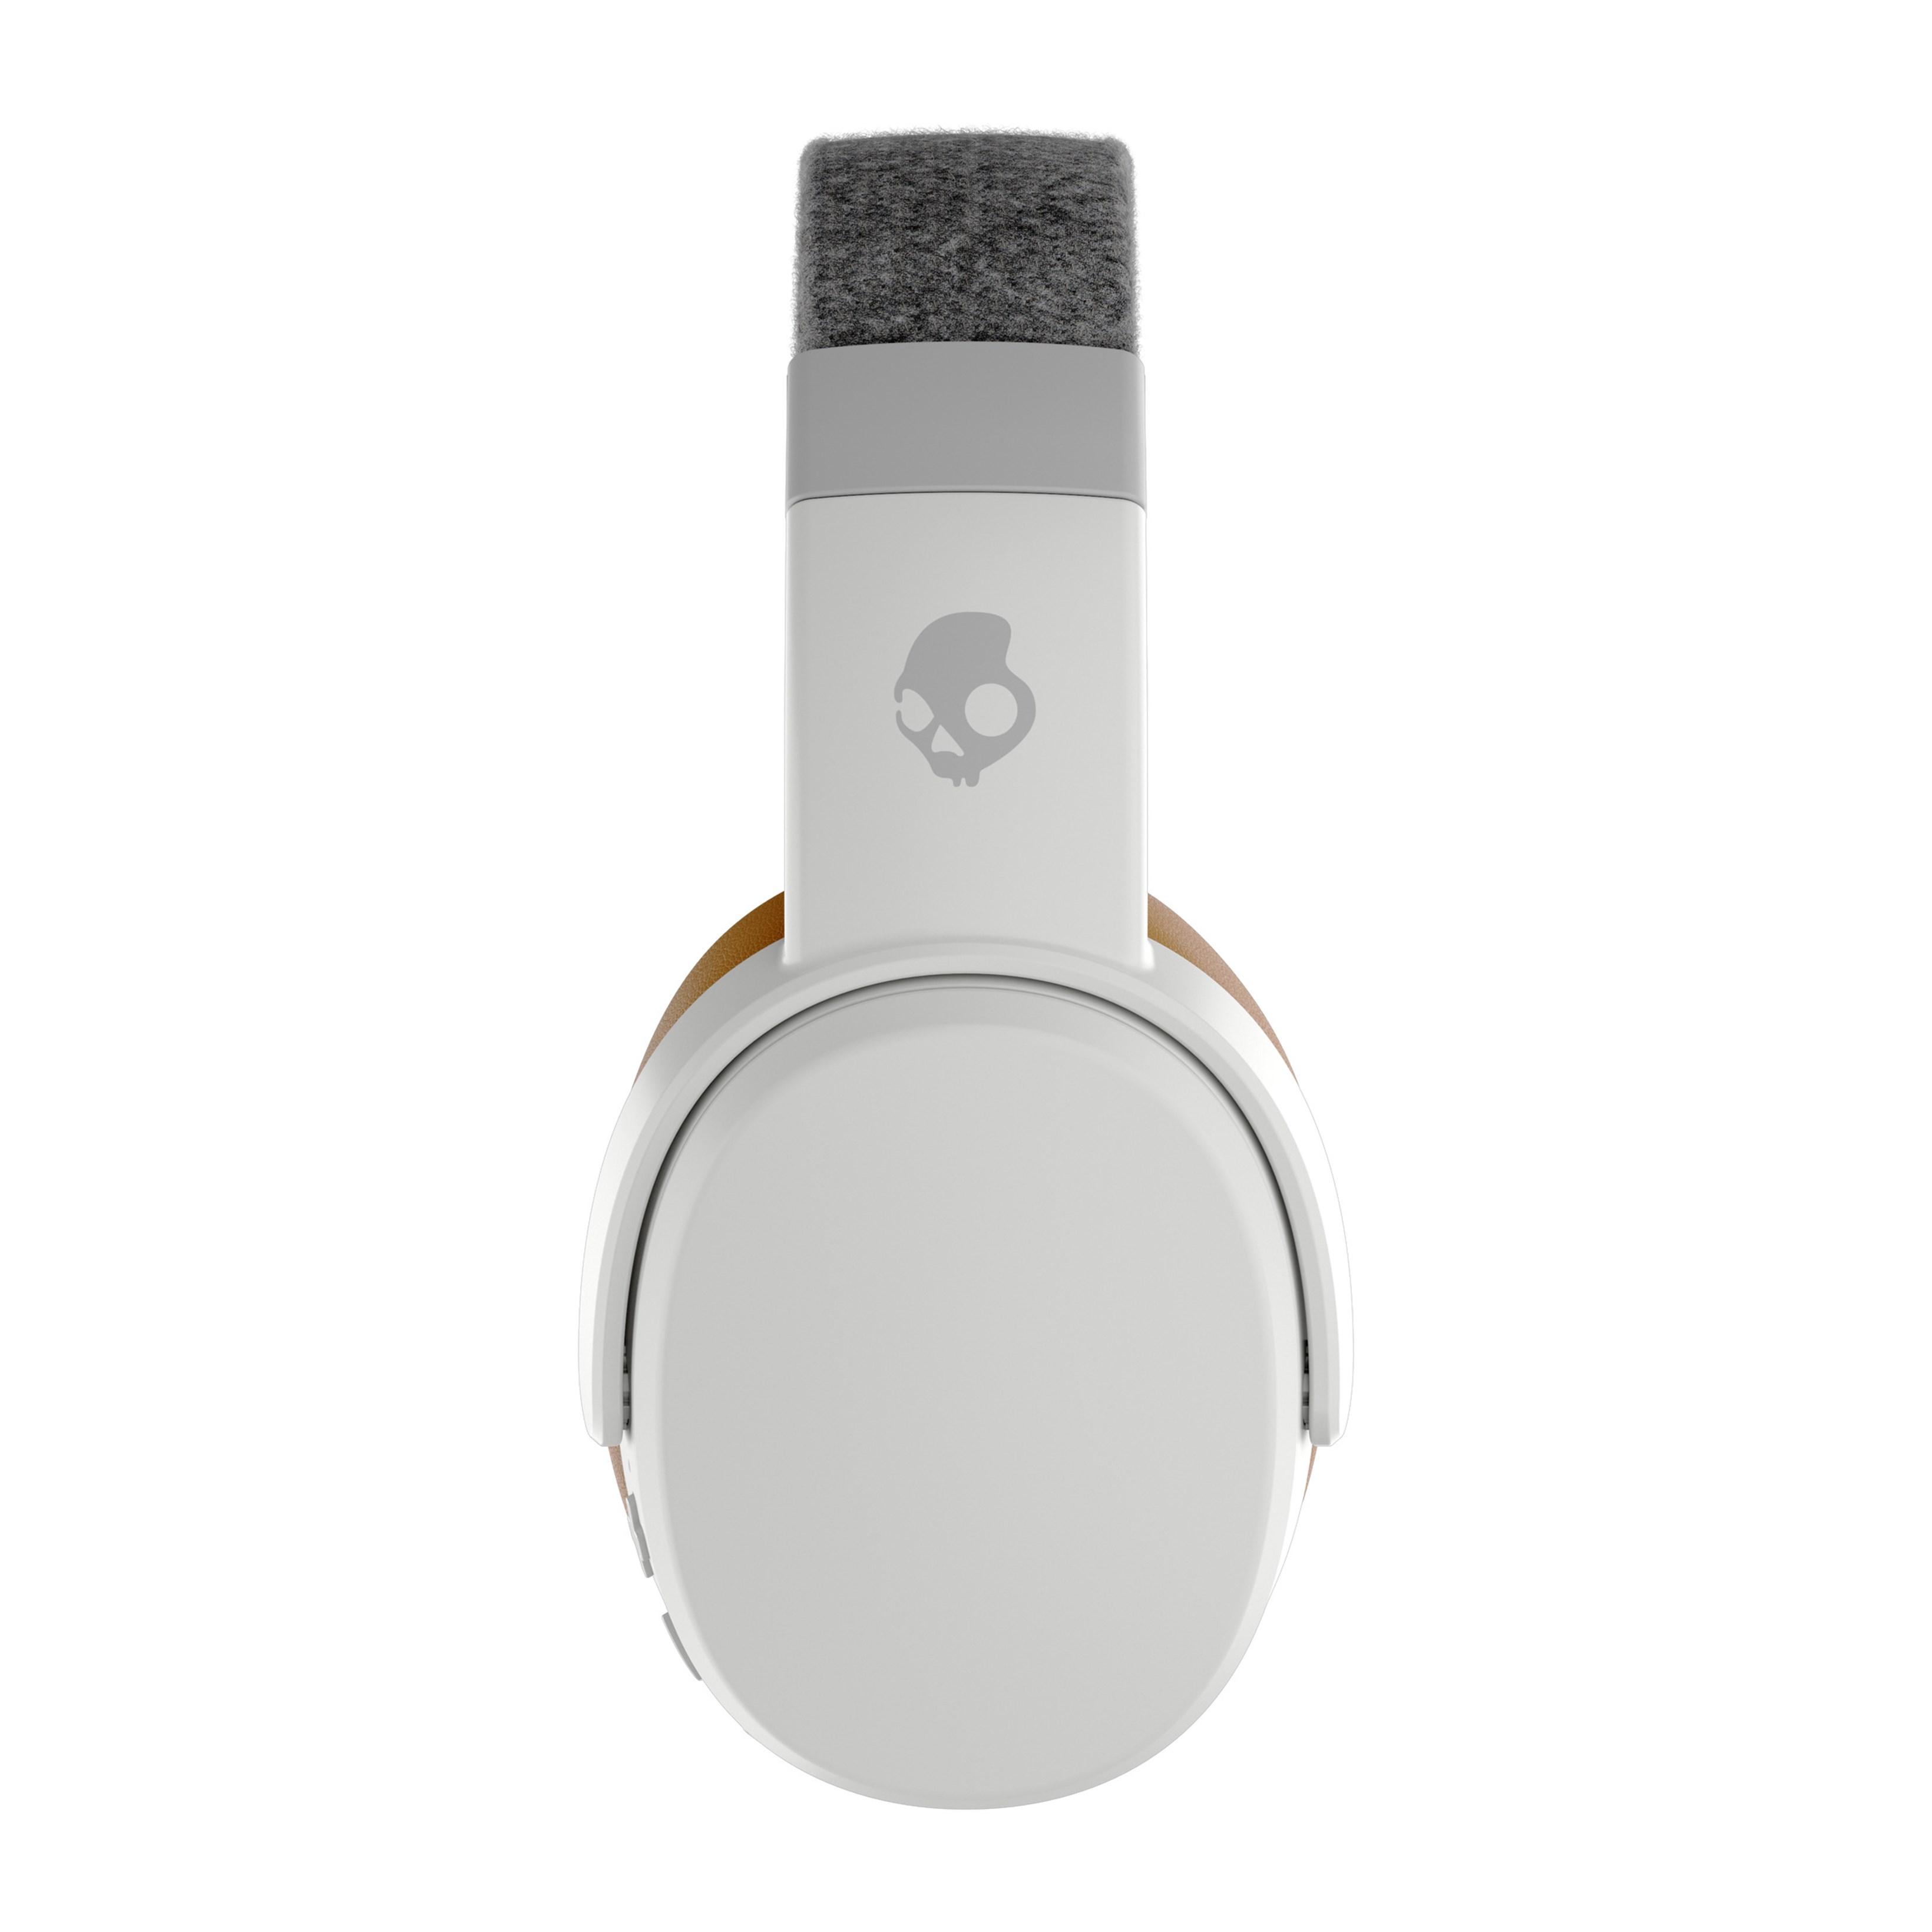 Skullcandy Crusher Grey/Tan Bluetooth Headphones - 3